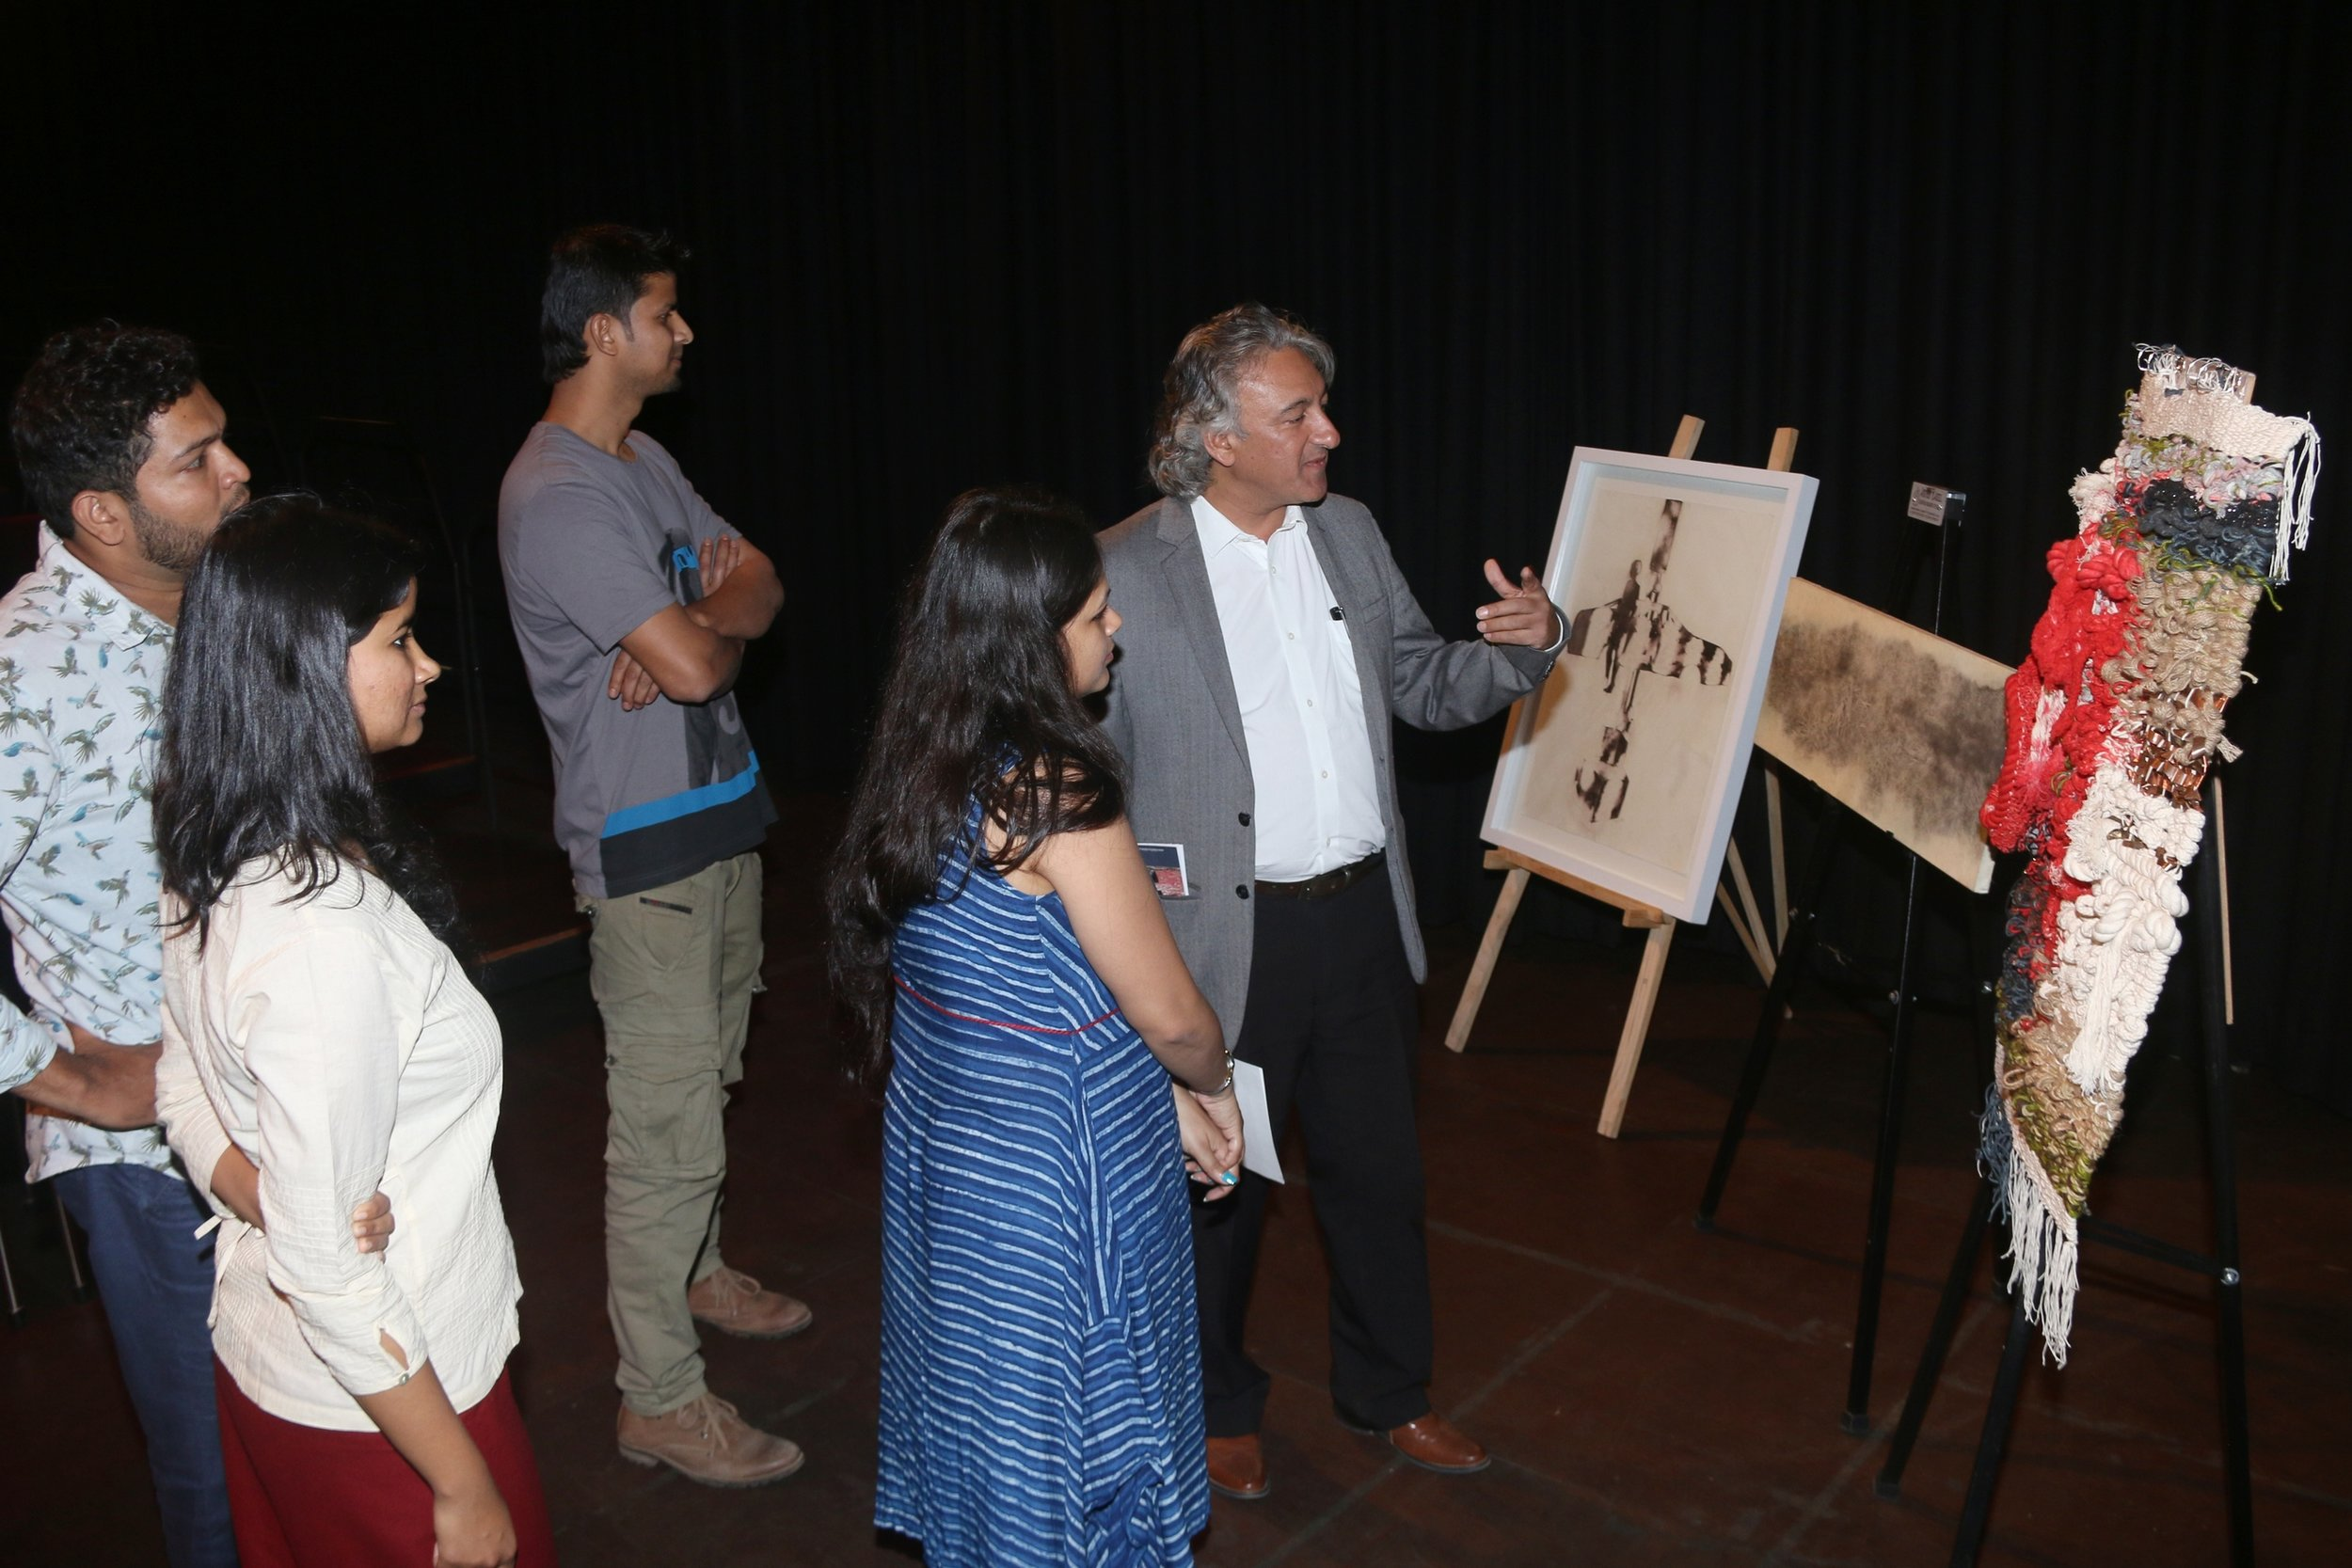 The Awardees share a moment with Anupam Sah.